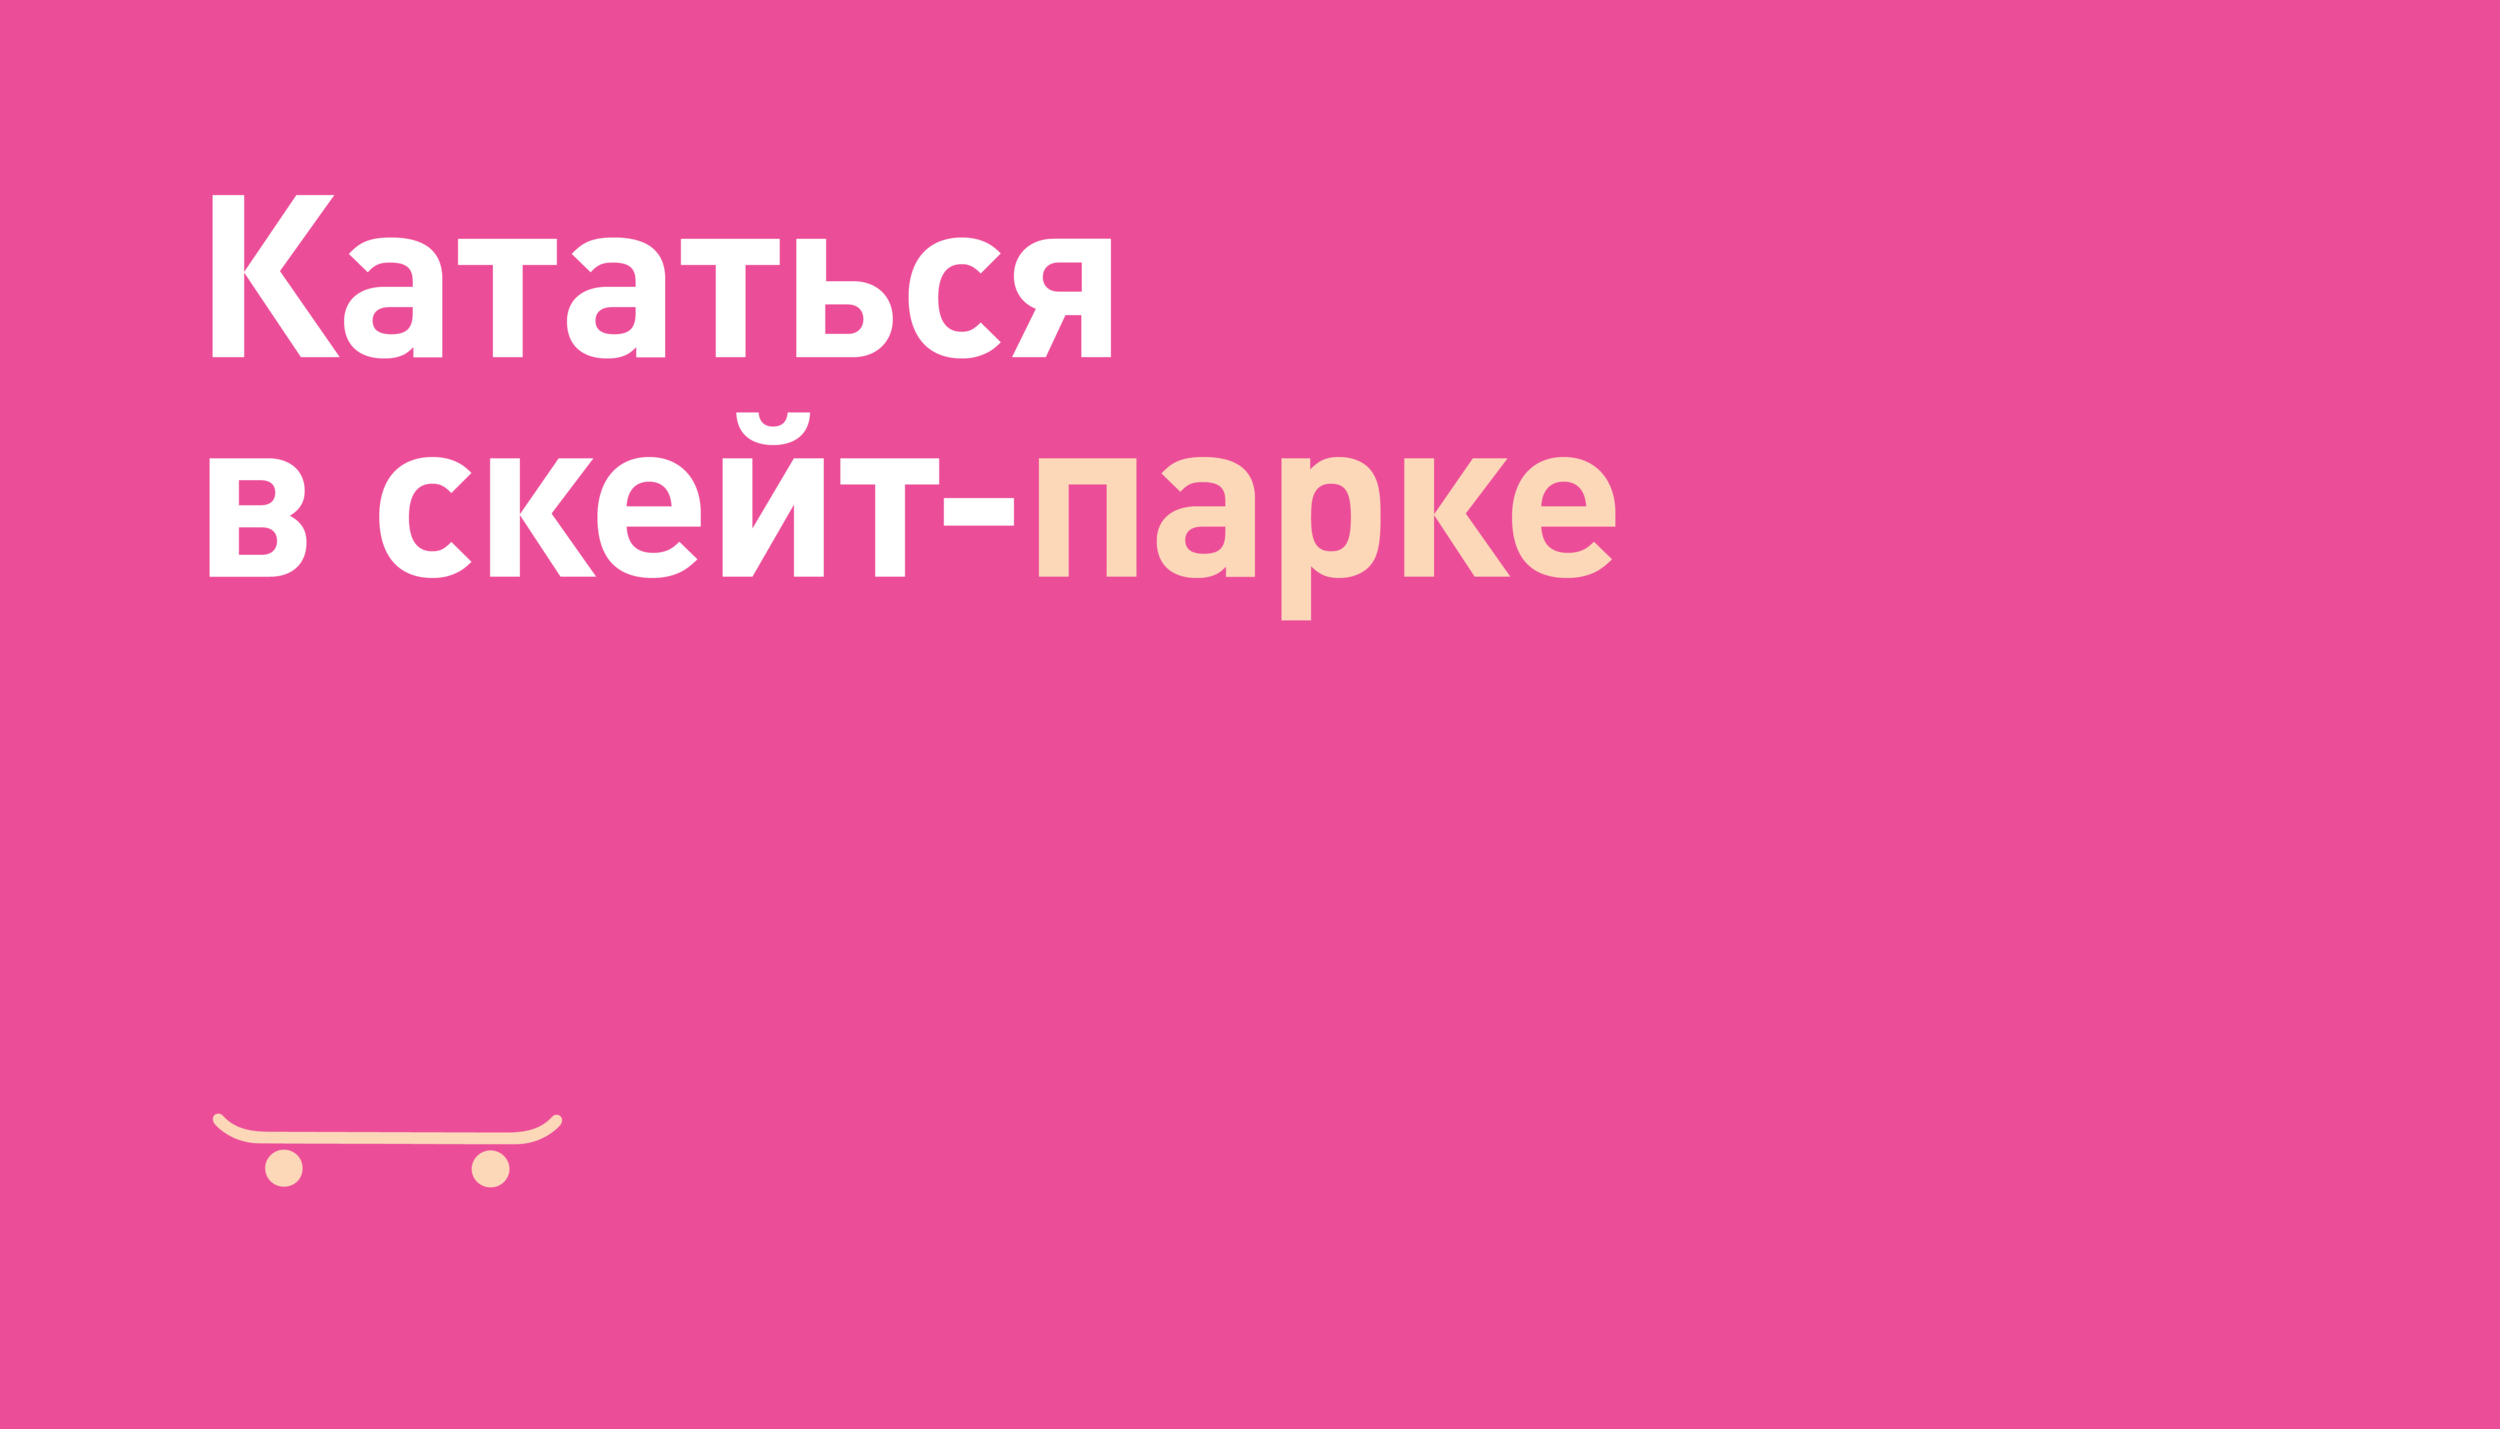 ParkGorkogo_Ice-cream_slogans-36.png